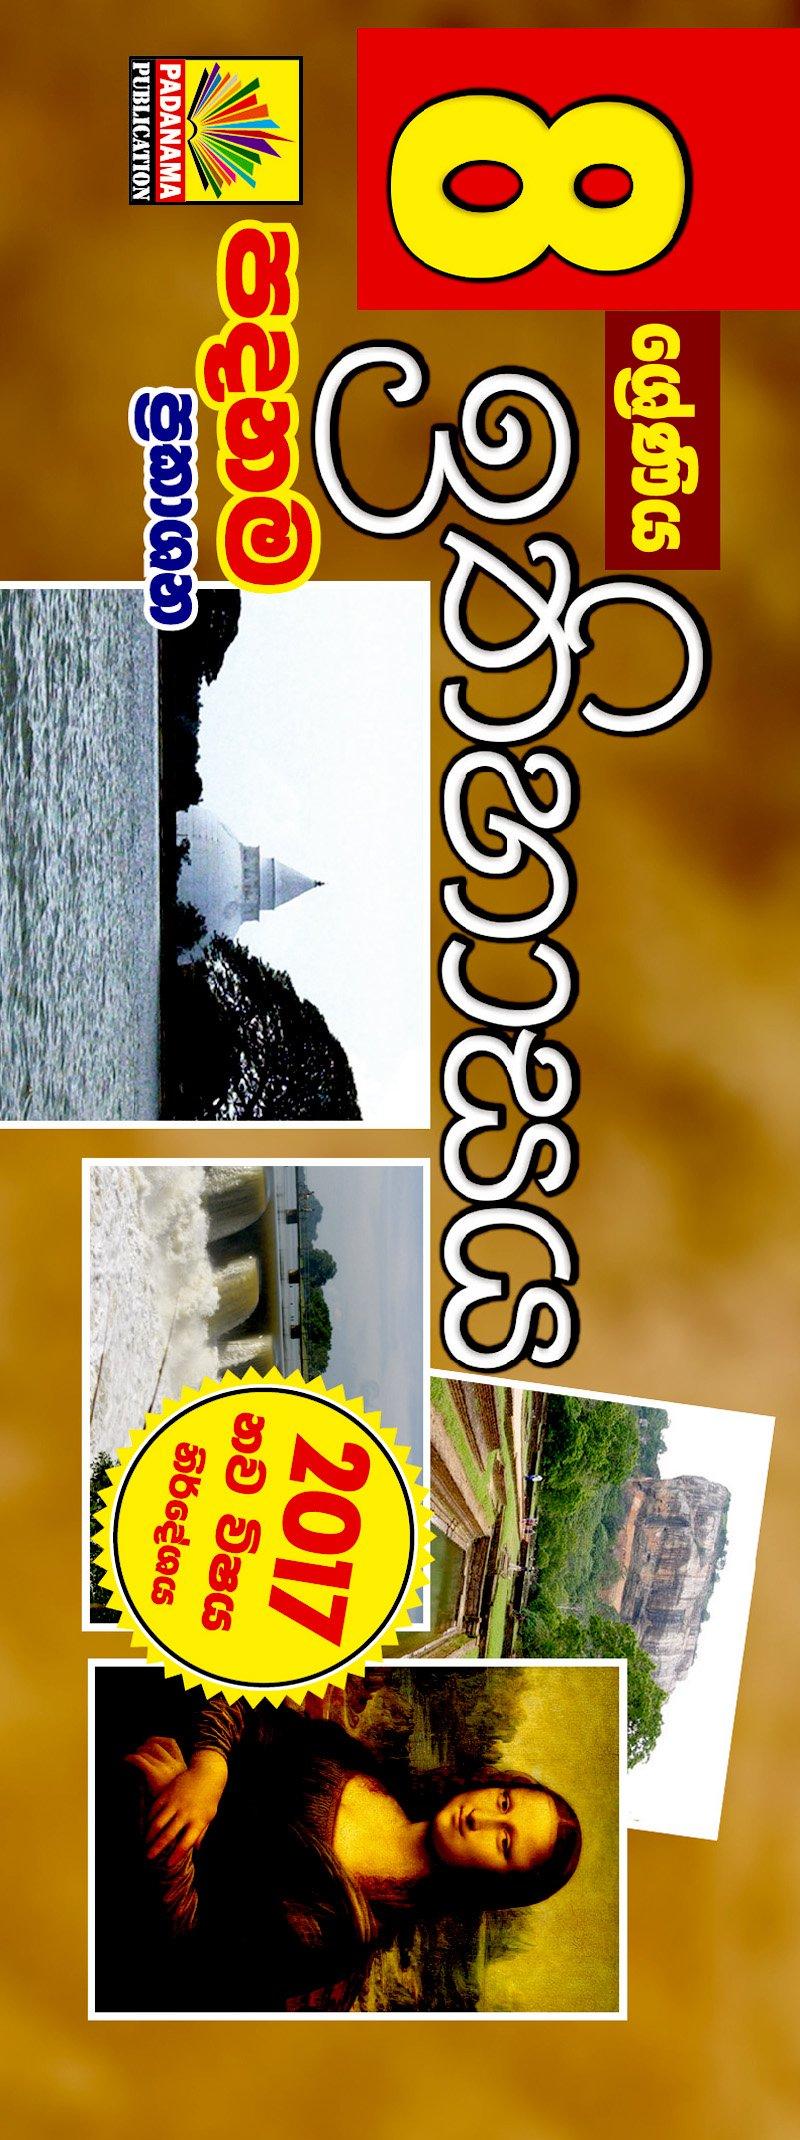 Padanama Publication - Online Book Store